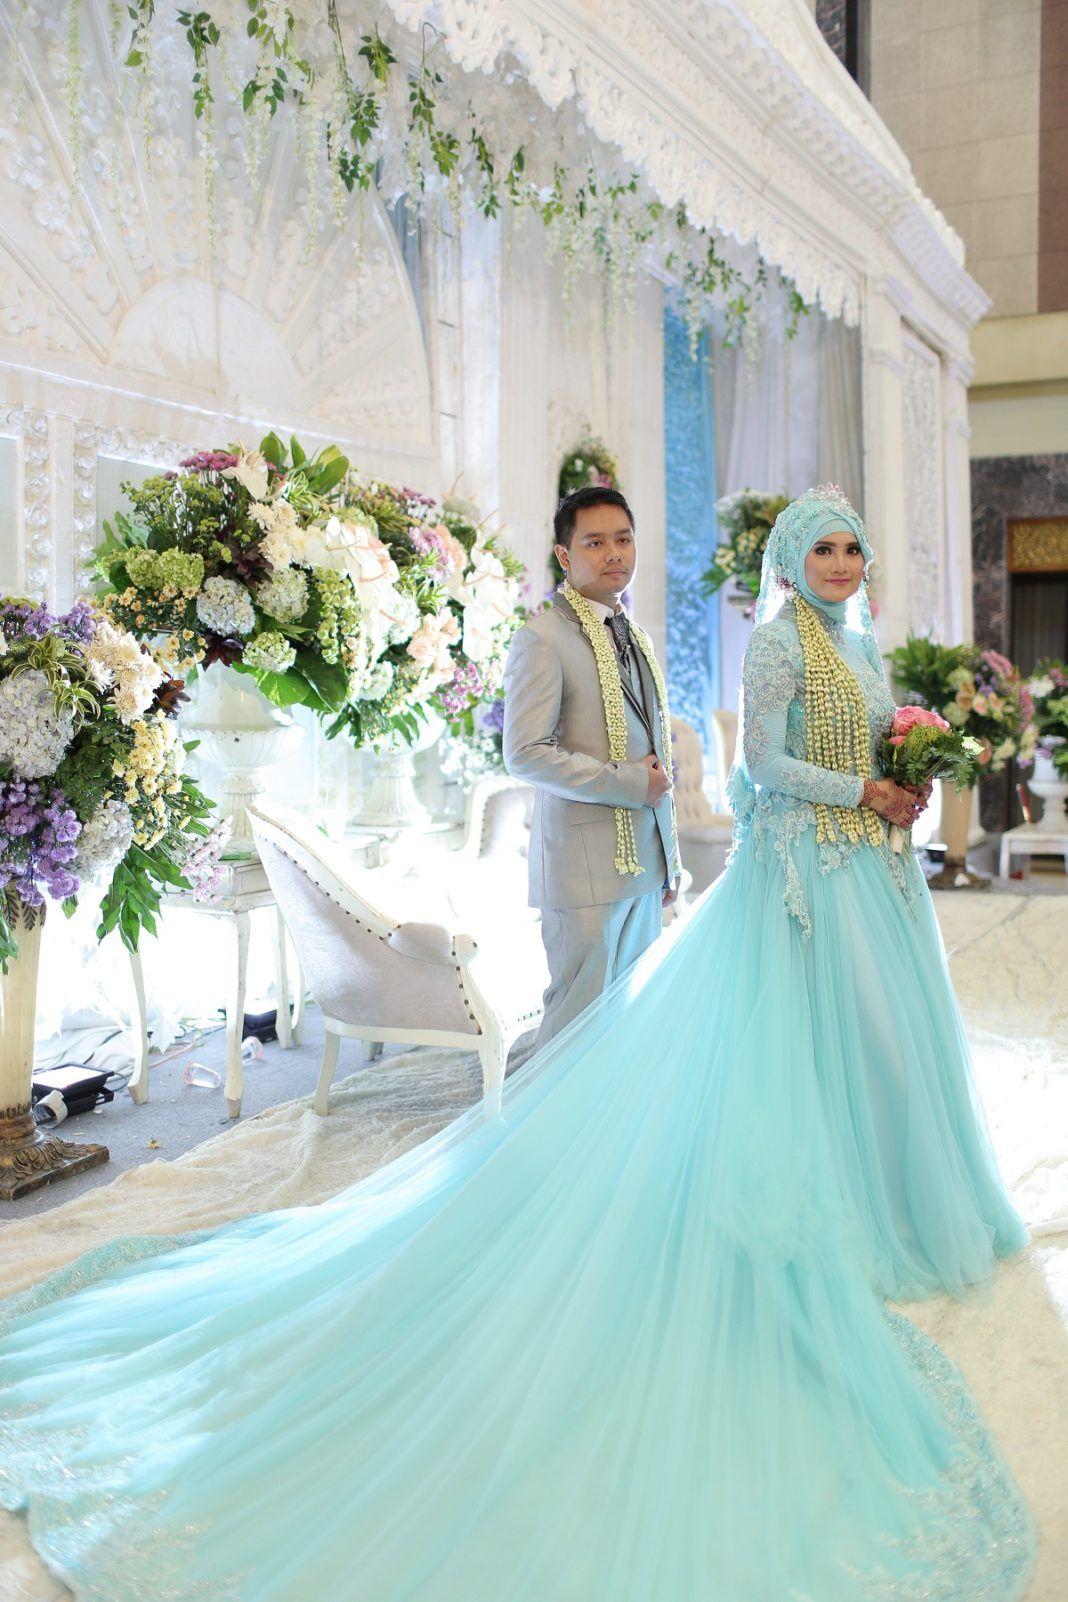 Model Gaun Pengantin Muslim Vatdv Gaun Gaun Pengantin Dan